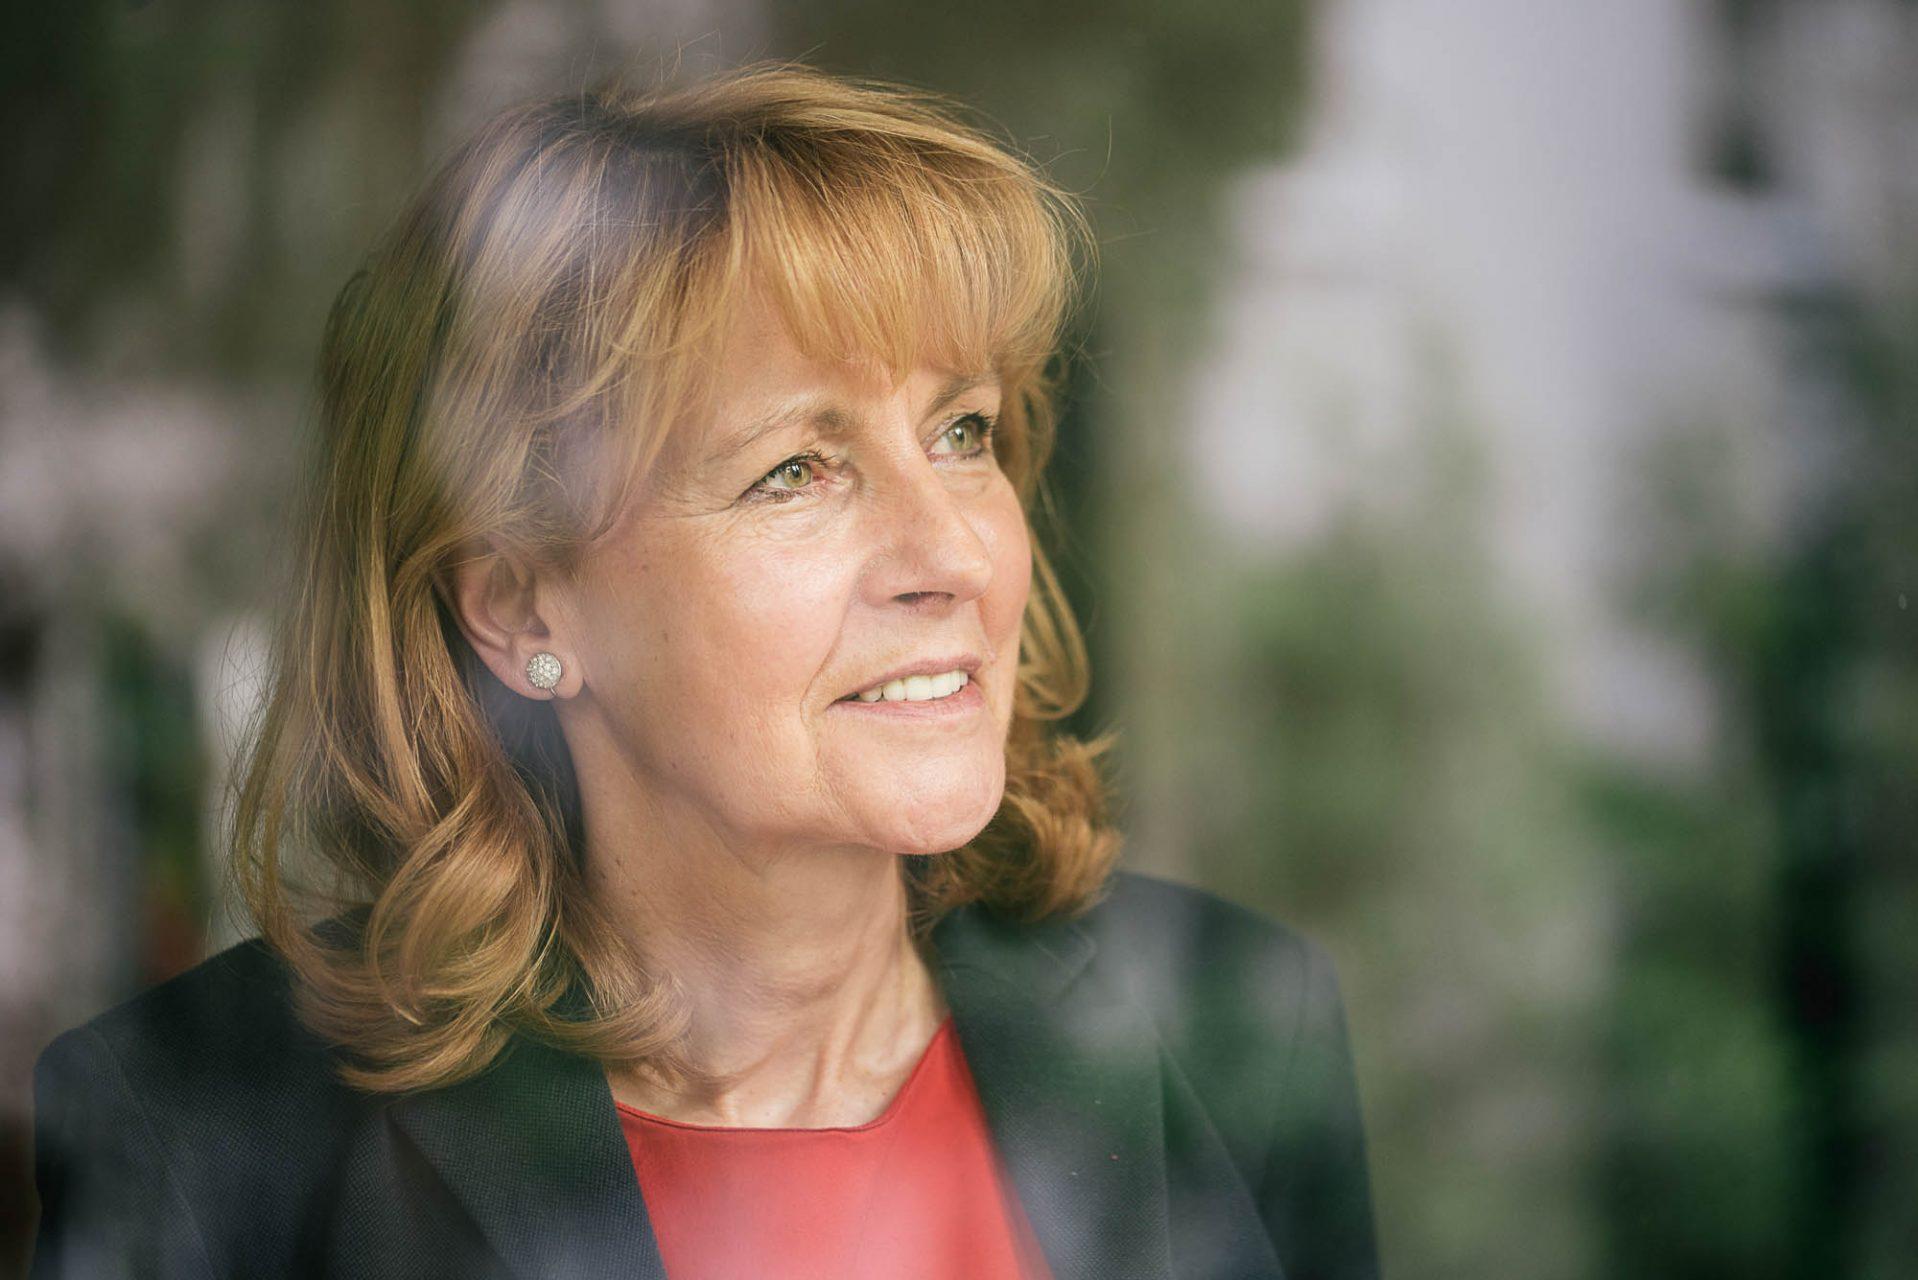 15.06.2017 Hannover: Edelgard Bulmahn bei sich zu Hause Foto: Moritz Küstner